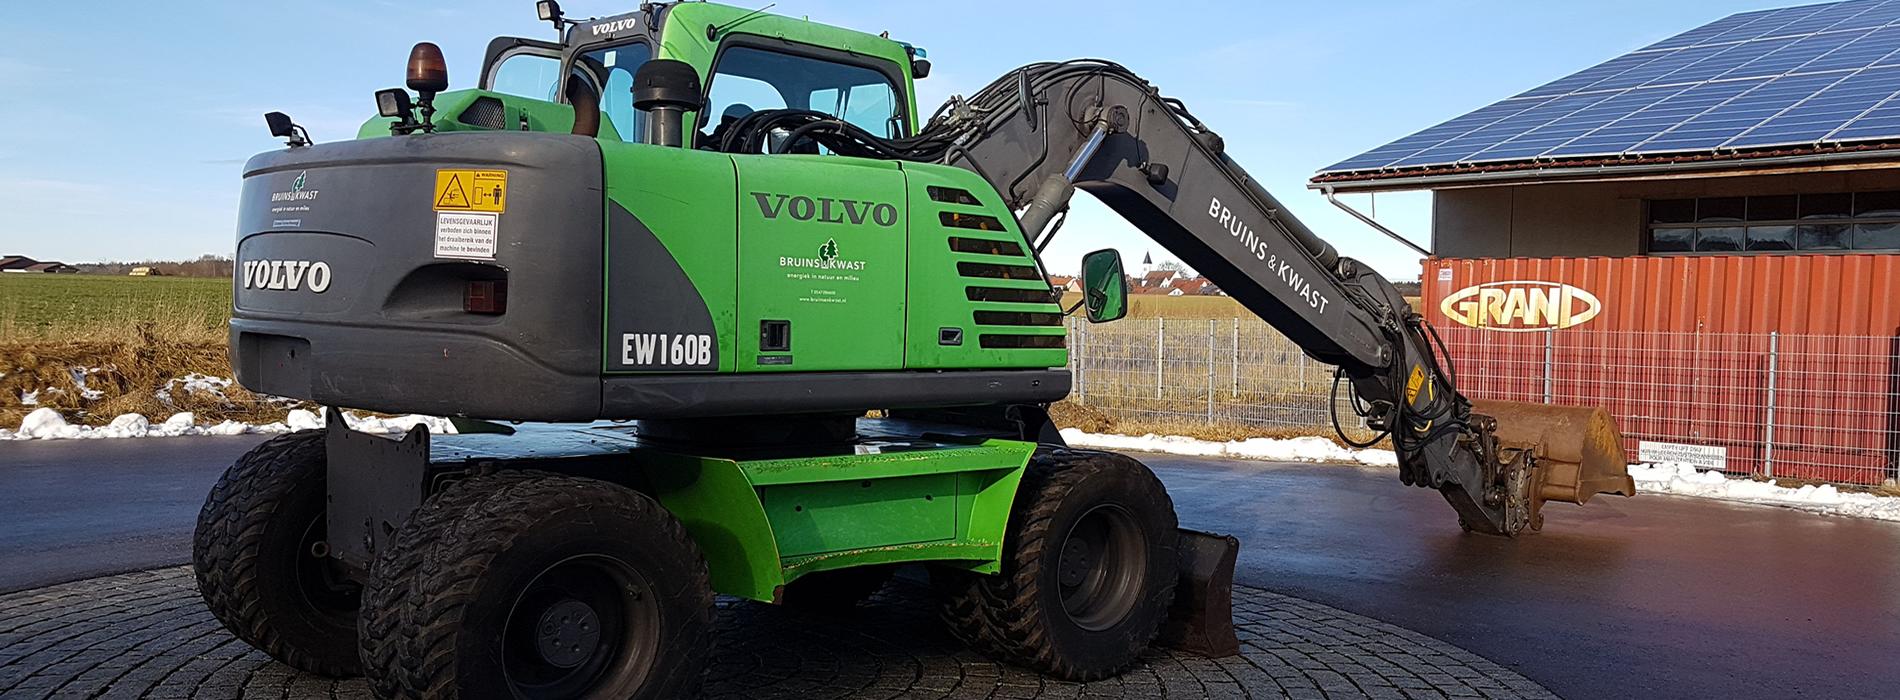 Inchiriere excavator, buldoexcavator, miniexcavator valcea